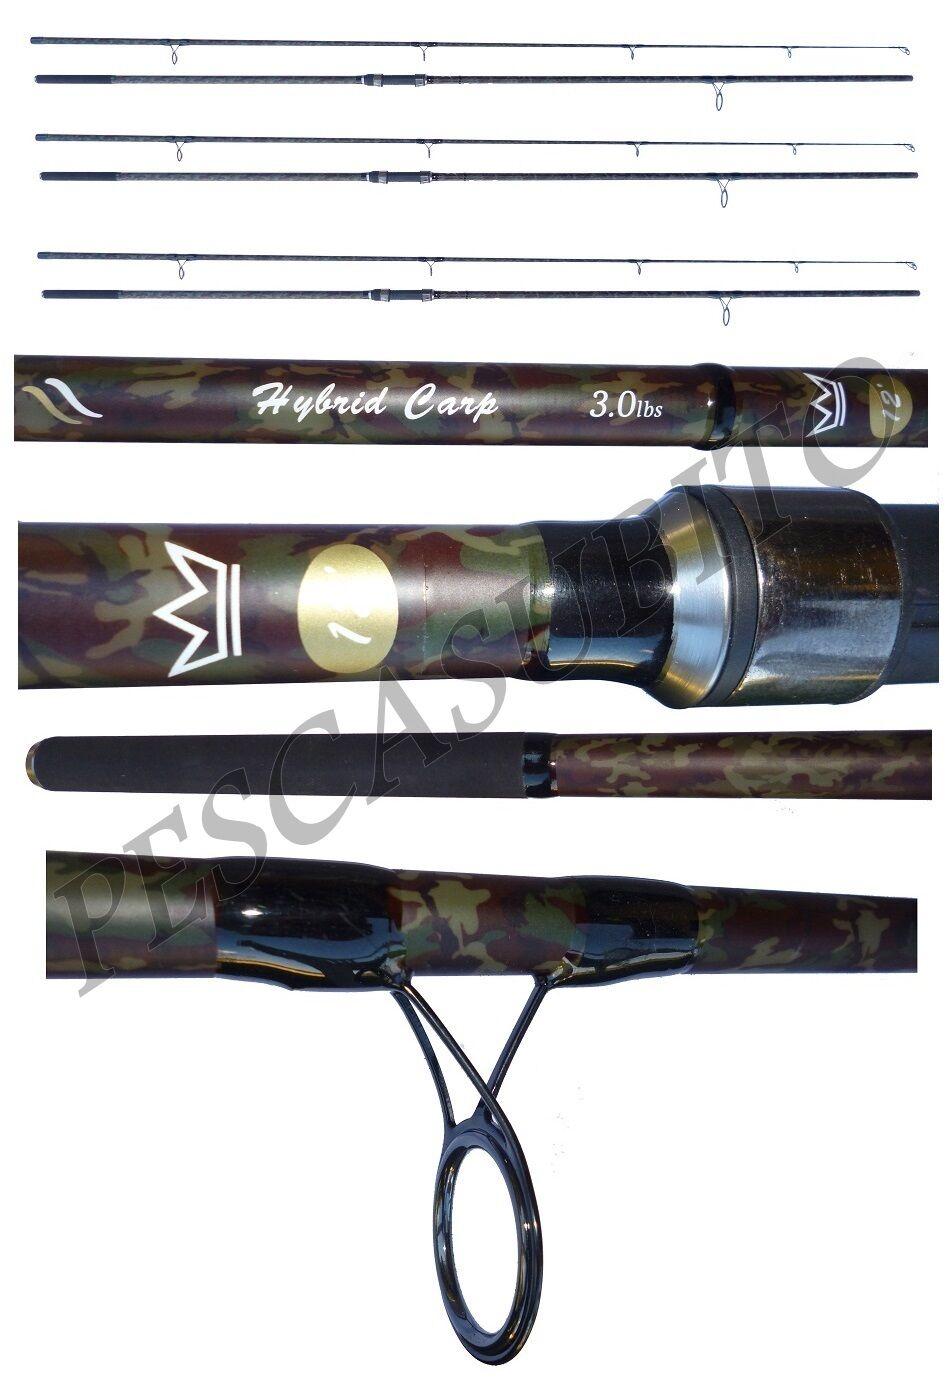 Kit 3 canne carpfishing hybrid 2.75lb mimetica pesca camo carpa fondo carbonio